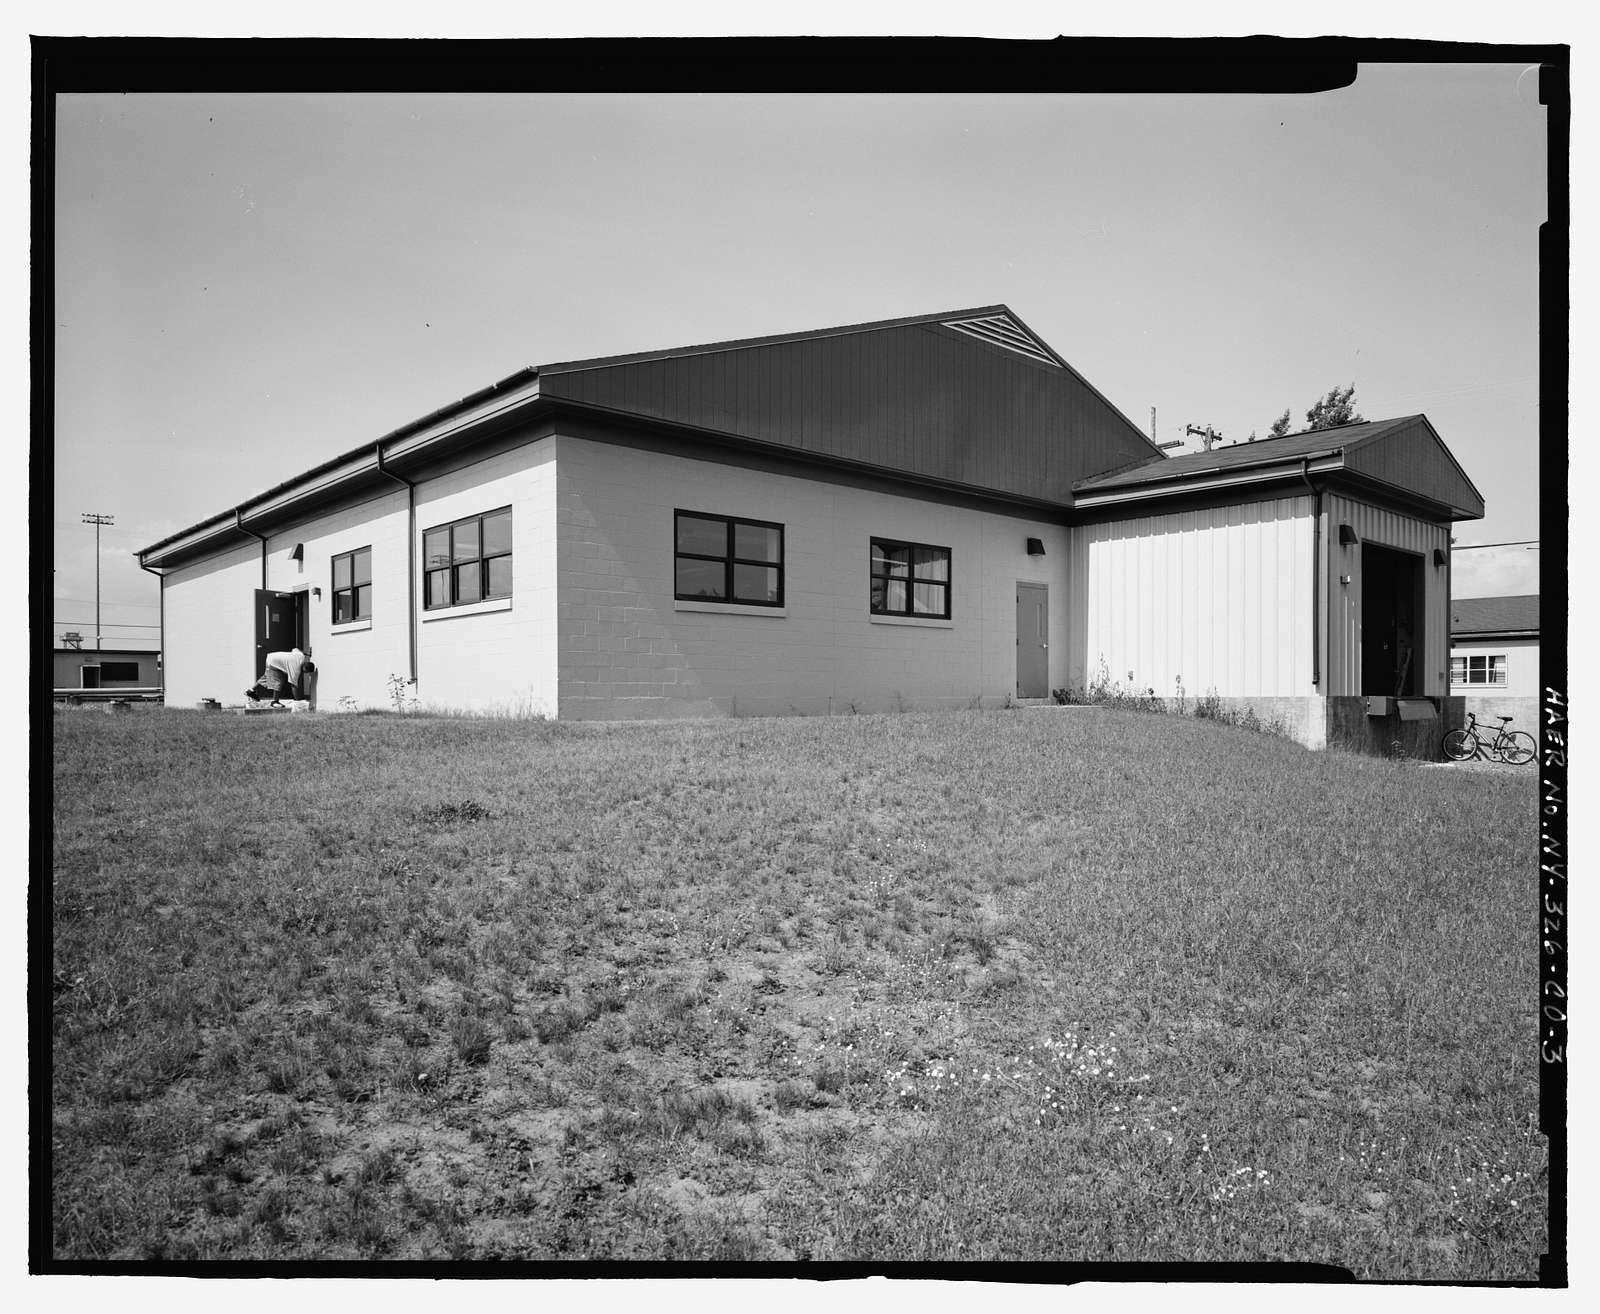 Plattsburgh Air Force Base, Squadron Operations Building, Florida Street, Plattsburgh, Clinton County, NY